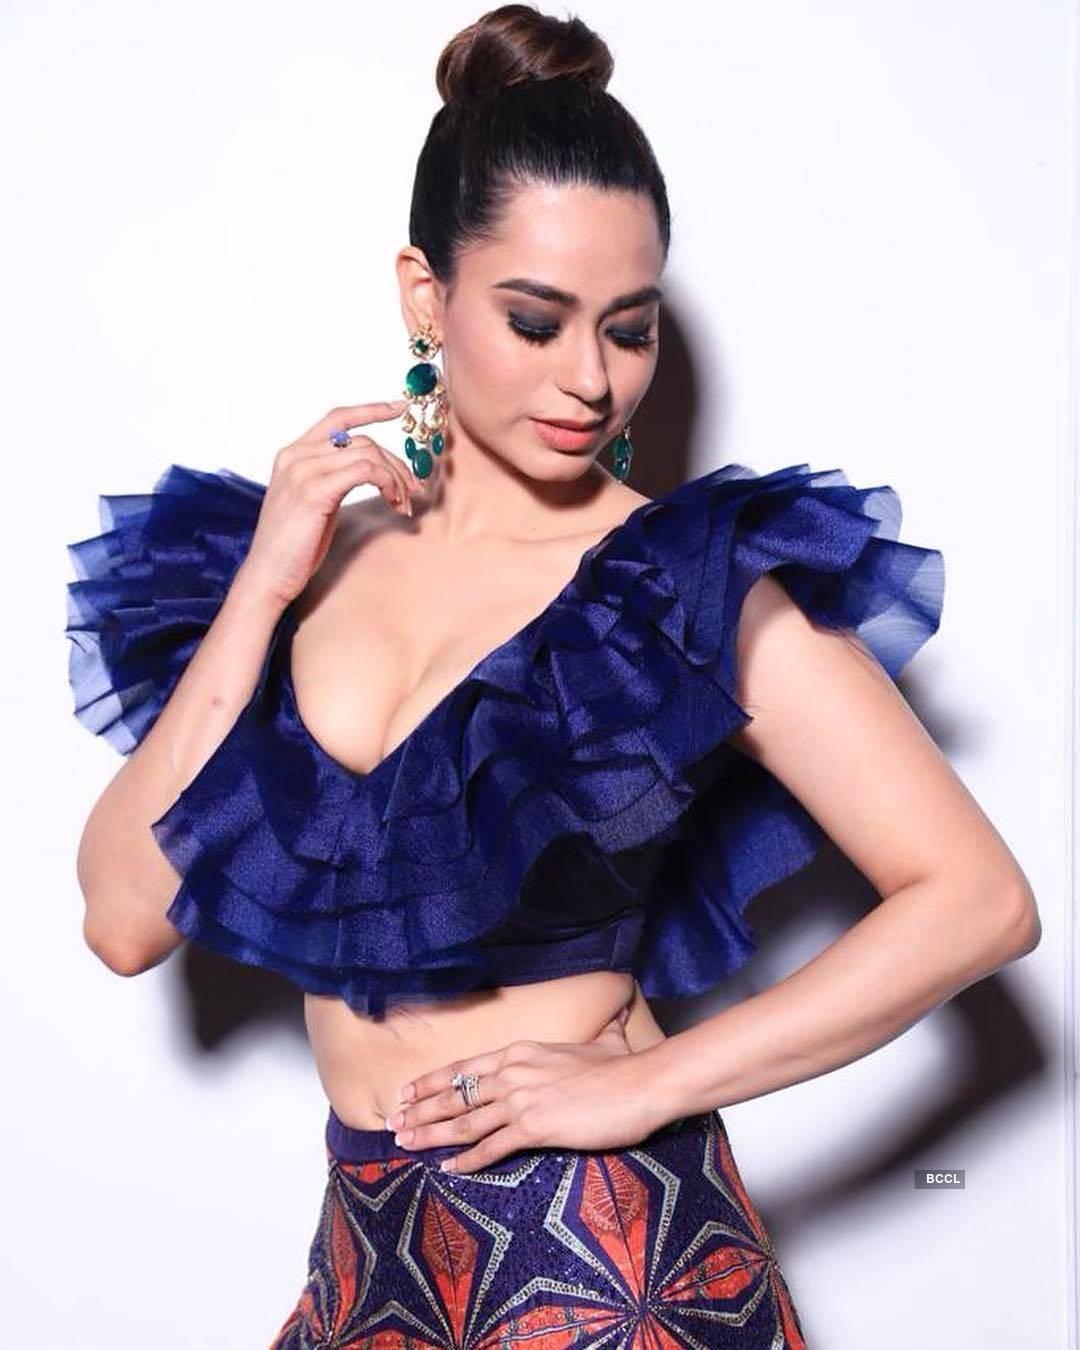 'Ranchi Diaries' star Soundarya Sharma is a true fashionista in real life